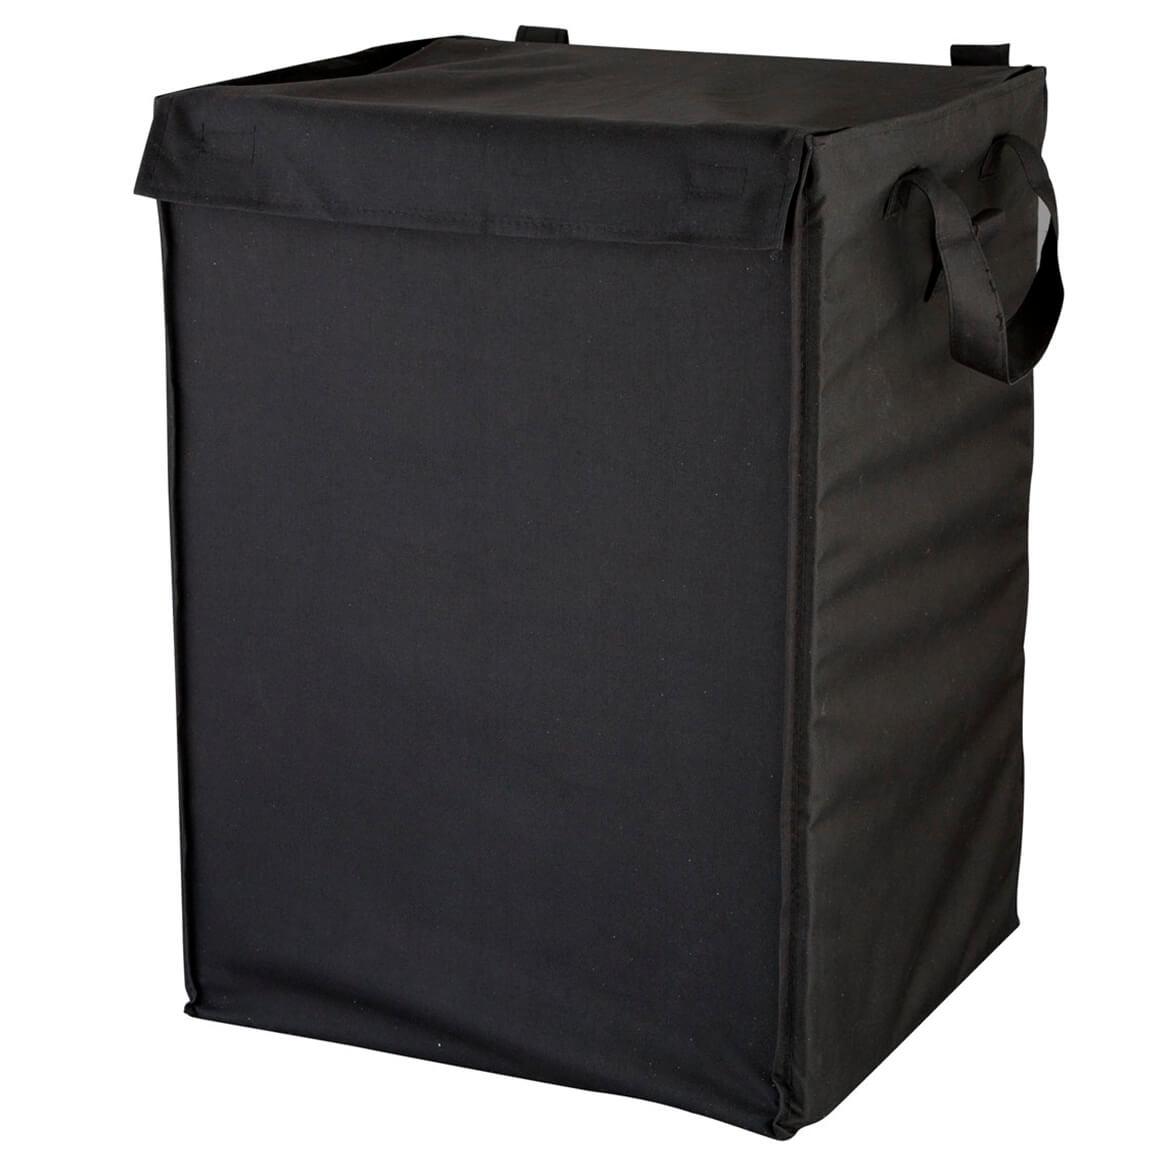 Waterproof Deluxe Shopping Cart Liner with Handles-343756